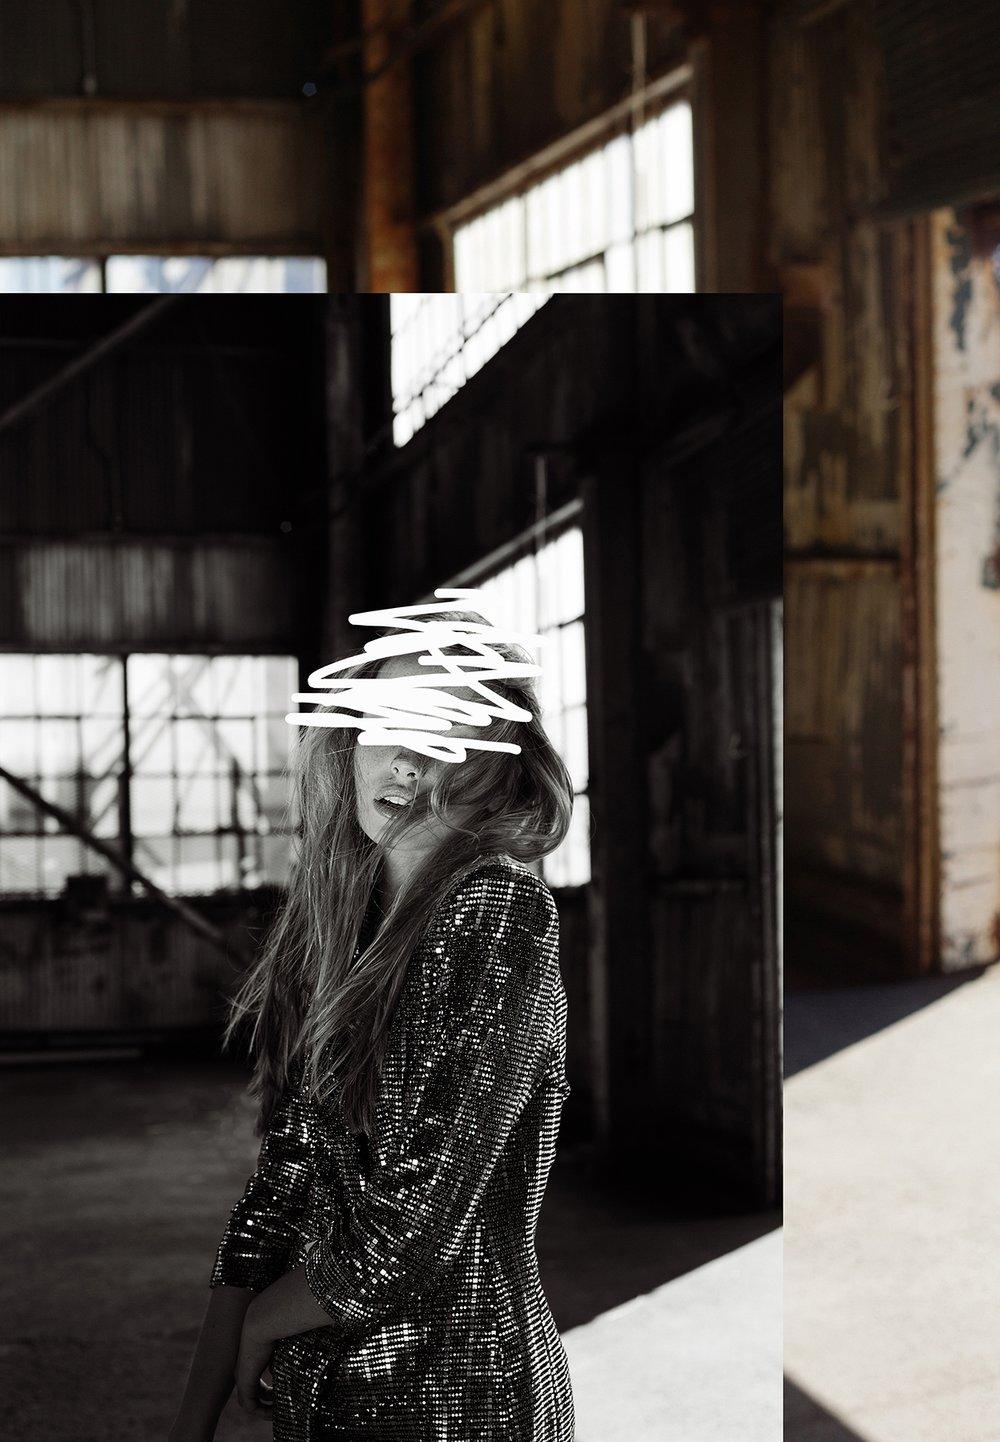 summer-wilson-photo-web-hidden-kate-graphic-0336.jpg